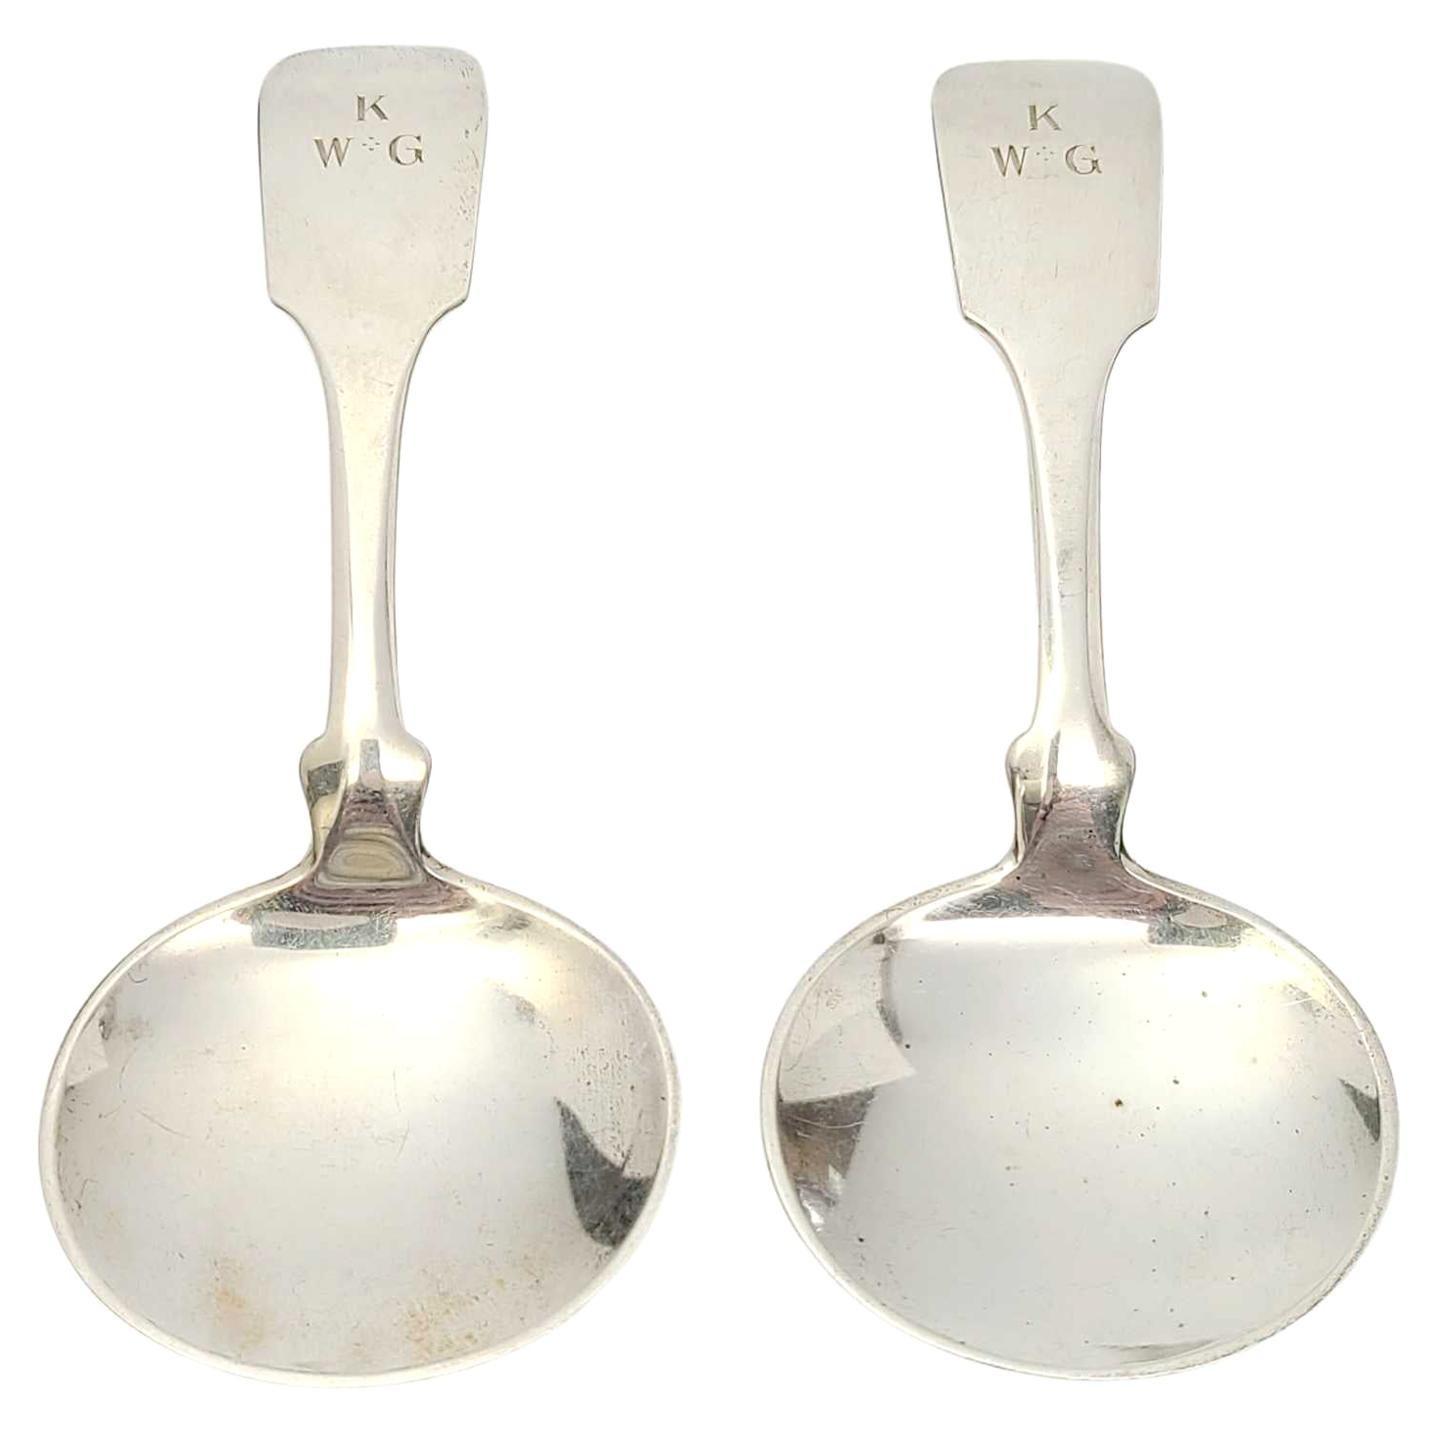 Set of 2 David Carlson Sterling Silver Arts & Crafts Tea Caddy Spoons